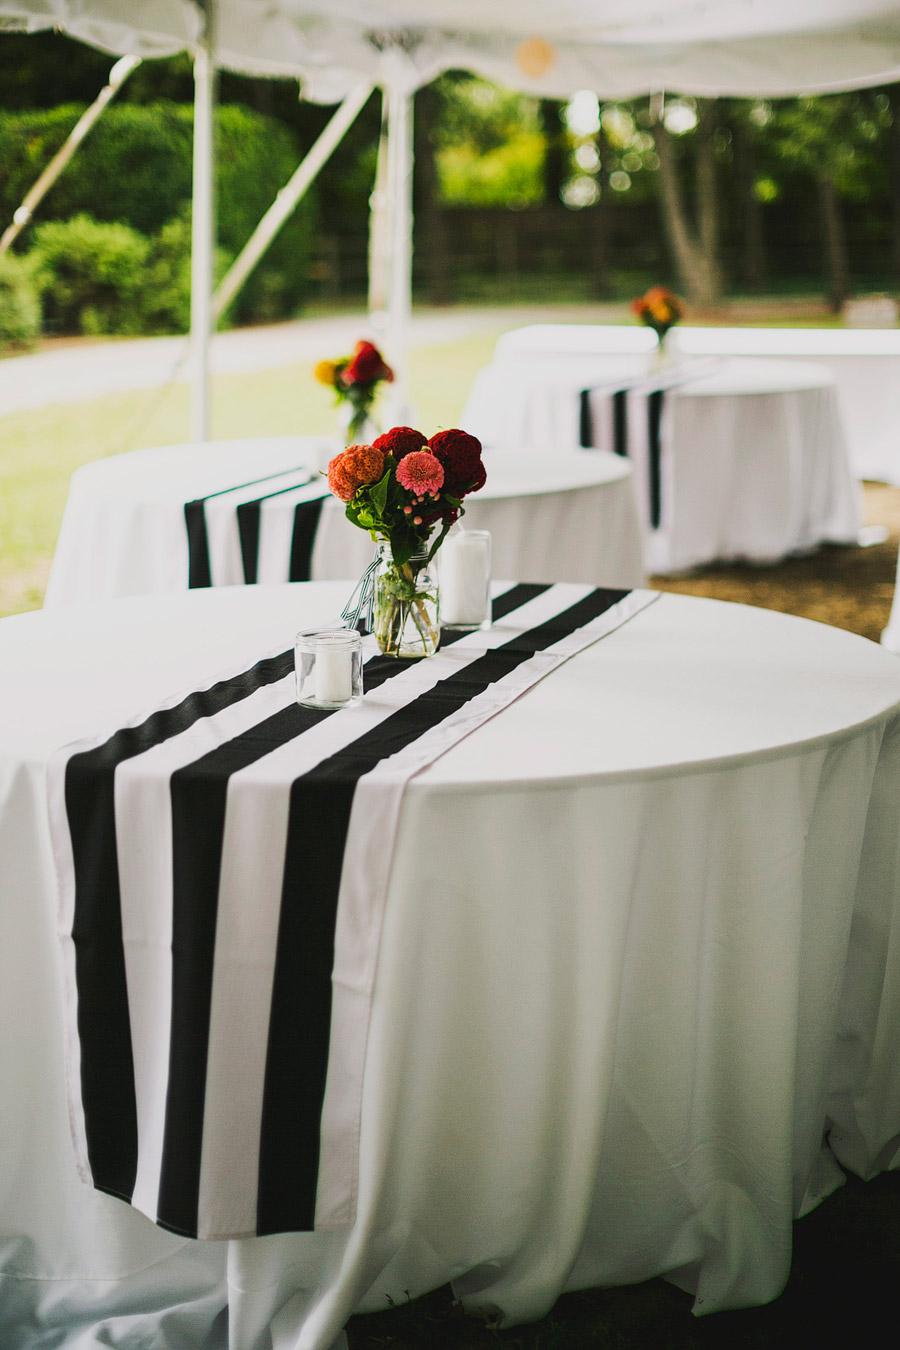 bk_wedding-details-171.jpg